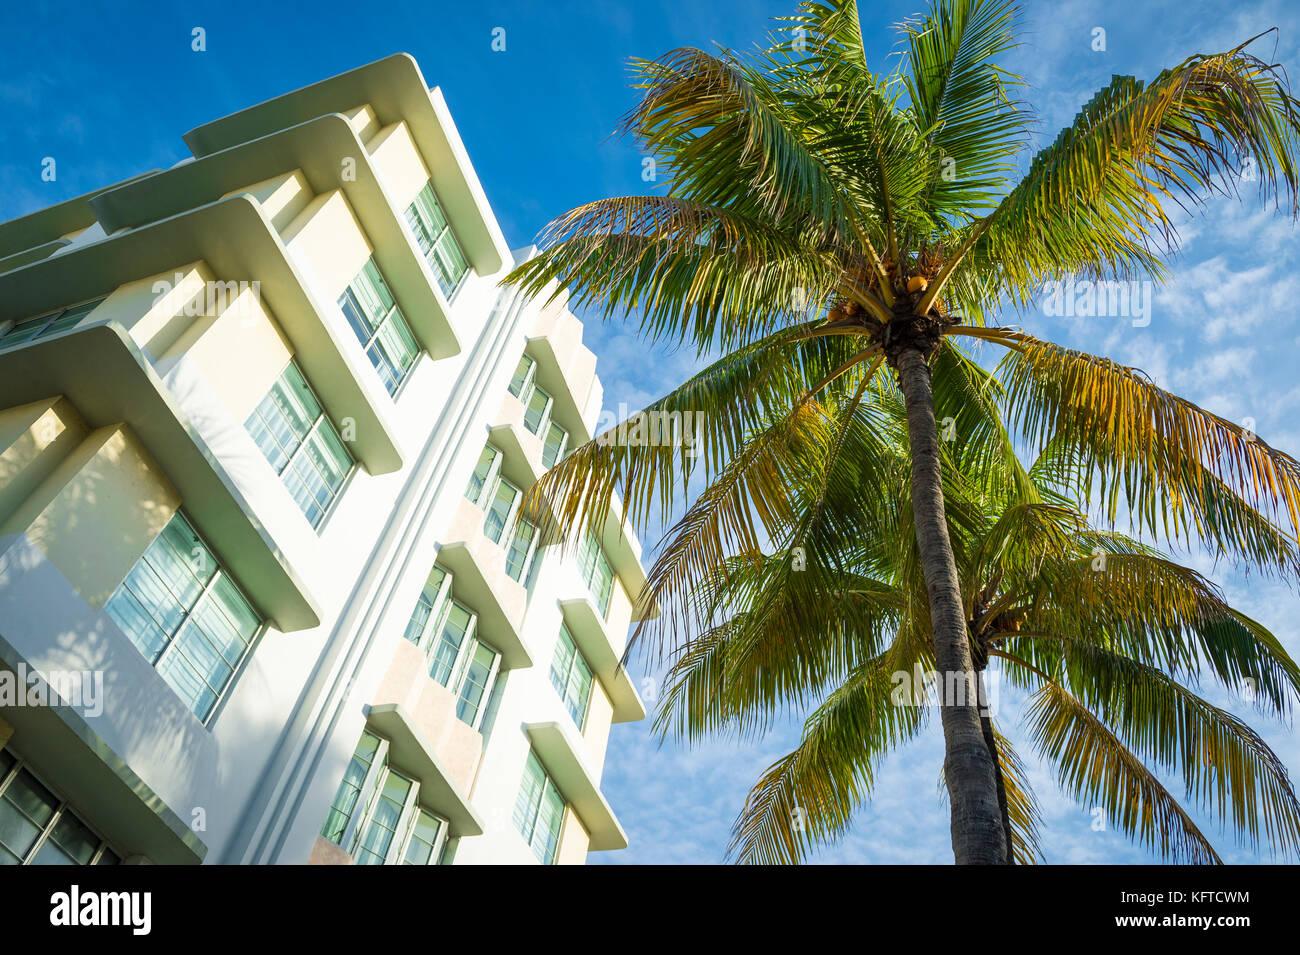 Classic 1930s art-deco era architecture and palm trees on Ocean Drive, Miami Beach. - Stock Image